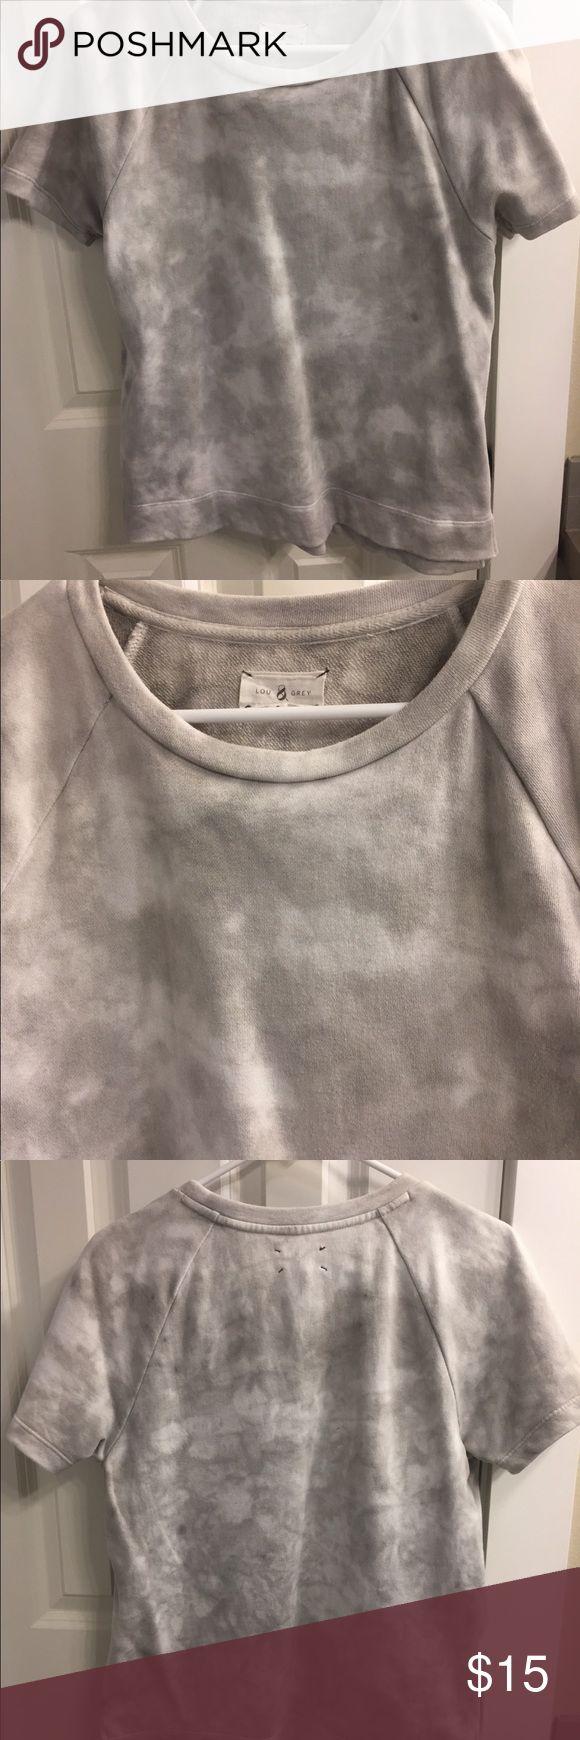 Lou&Grey short sleeve sweatshirt. Tie dye effect Lou&Grey short sleeve sweatshirt. Tie dye effect. New condition lou&grey Tops Sweatshirts & Hoodies